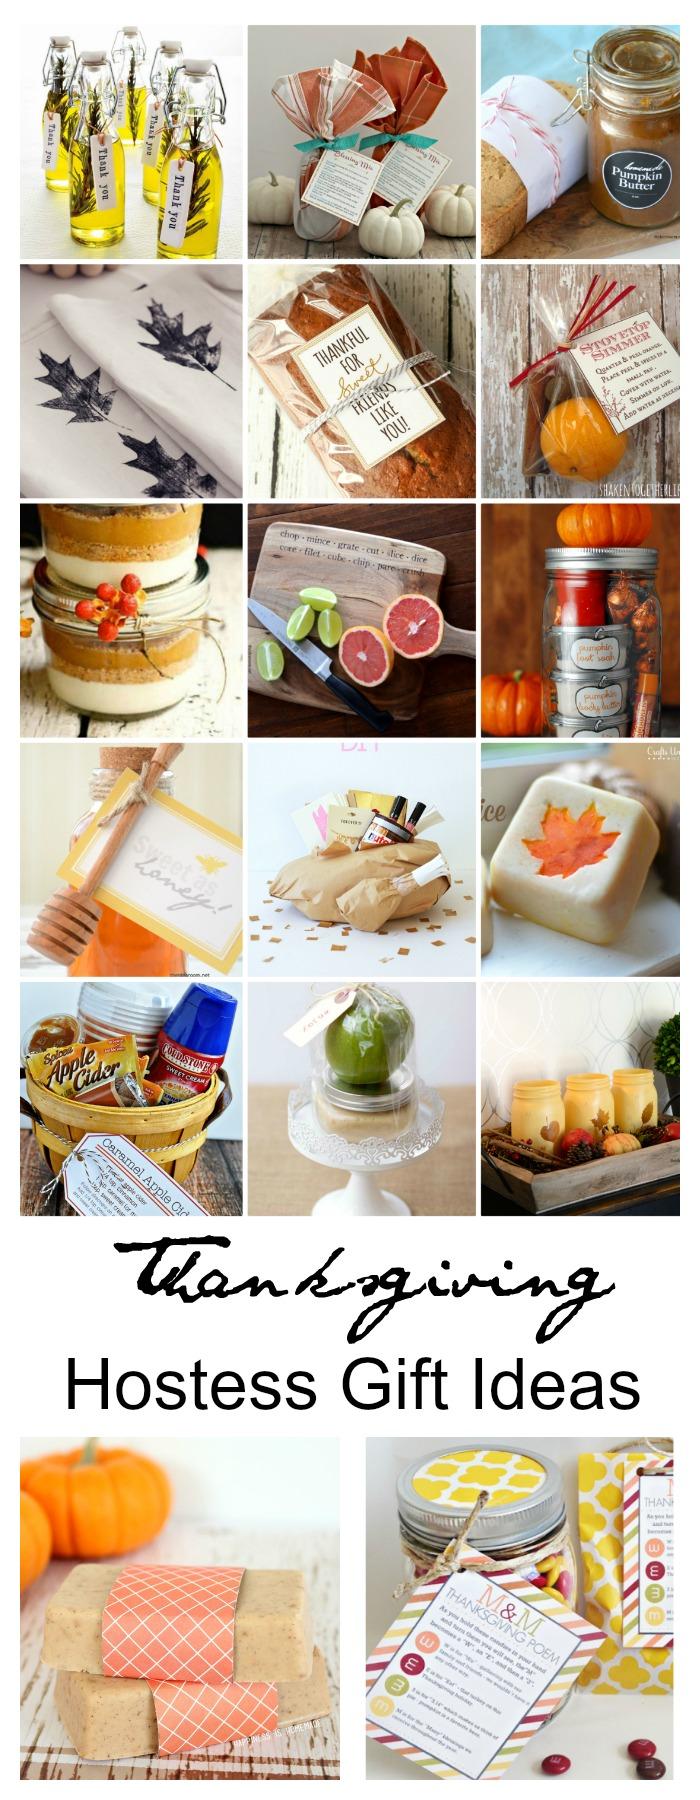 Thanksgiving-Hostess-Gift-Ideas-Pin